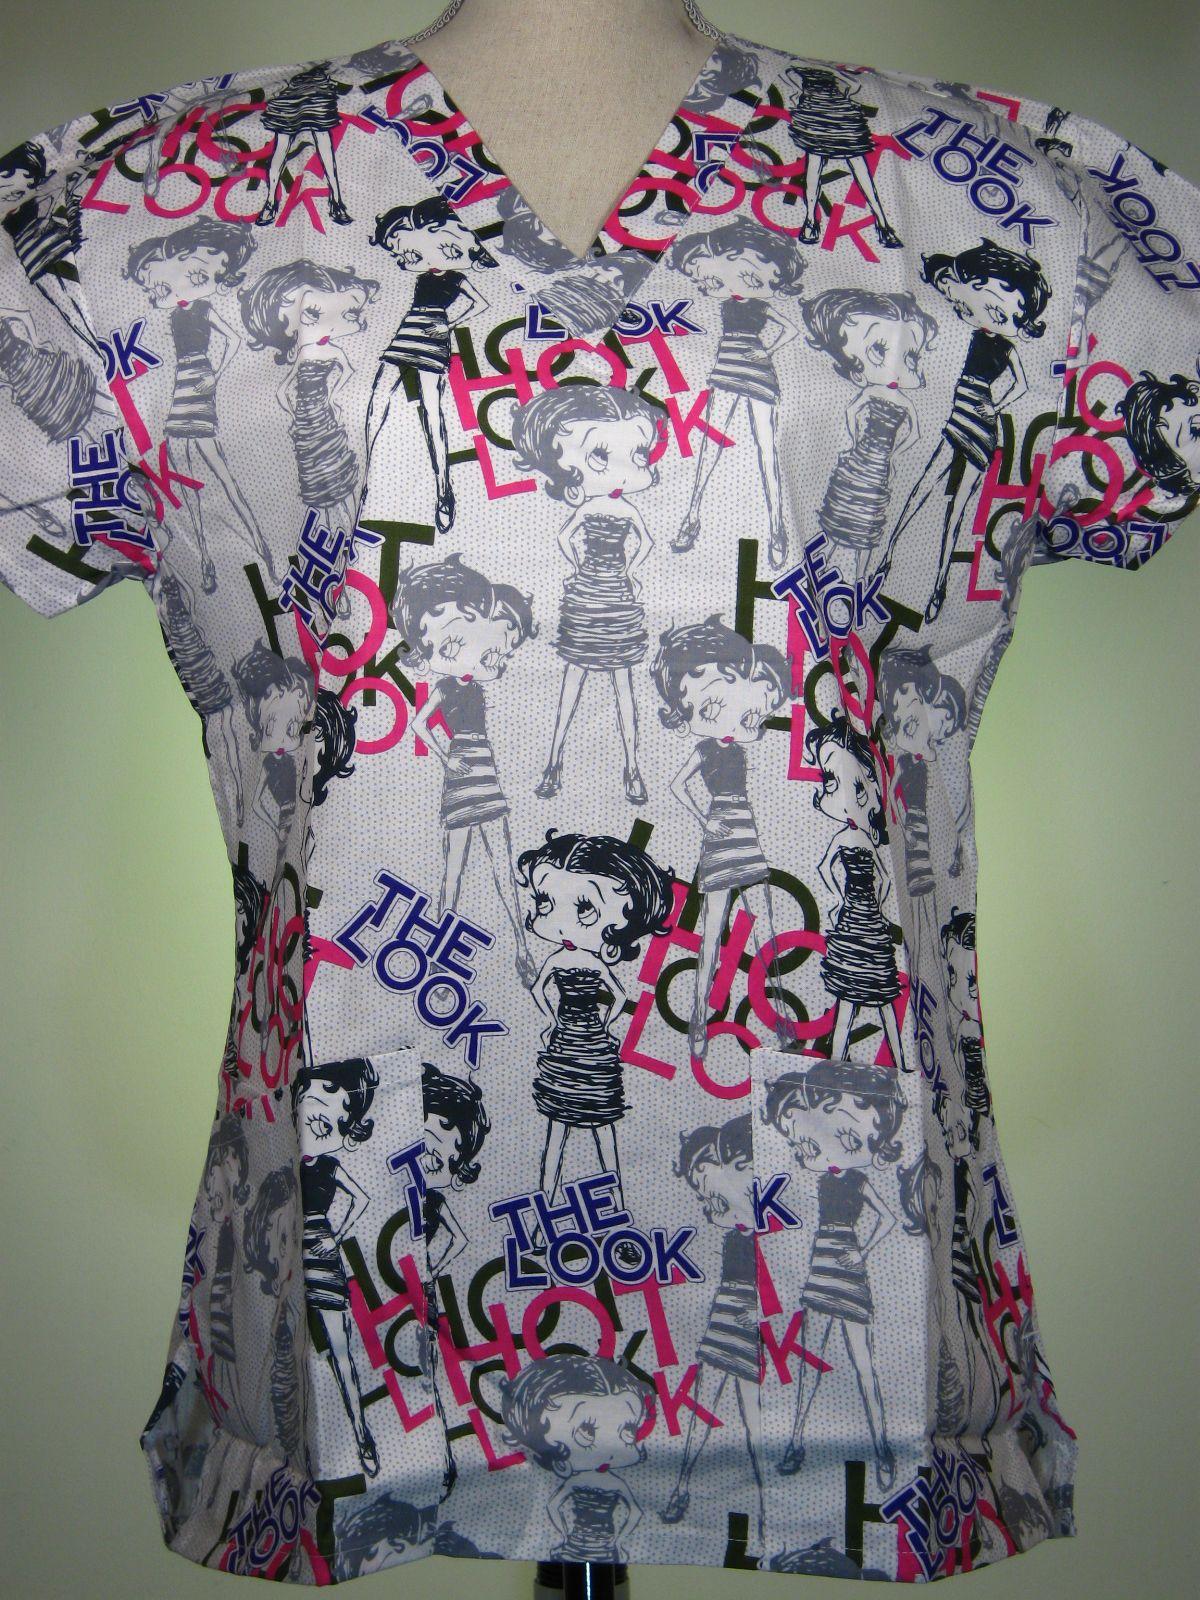 808fa1267ff #caringplus scrub top - Betty Boop, the hot look - CaringPlus scrubs and  uniforms